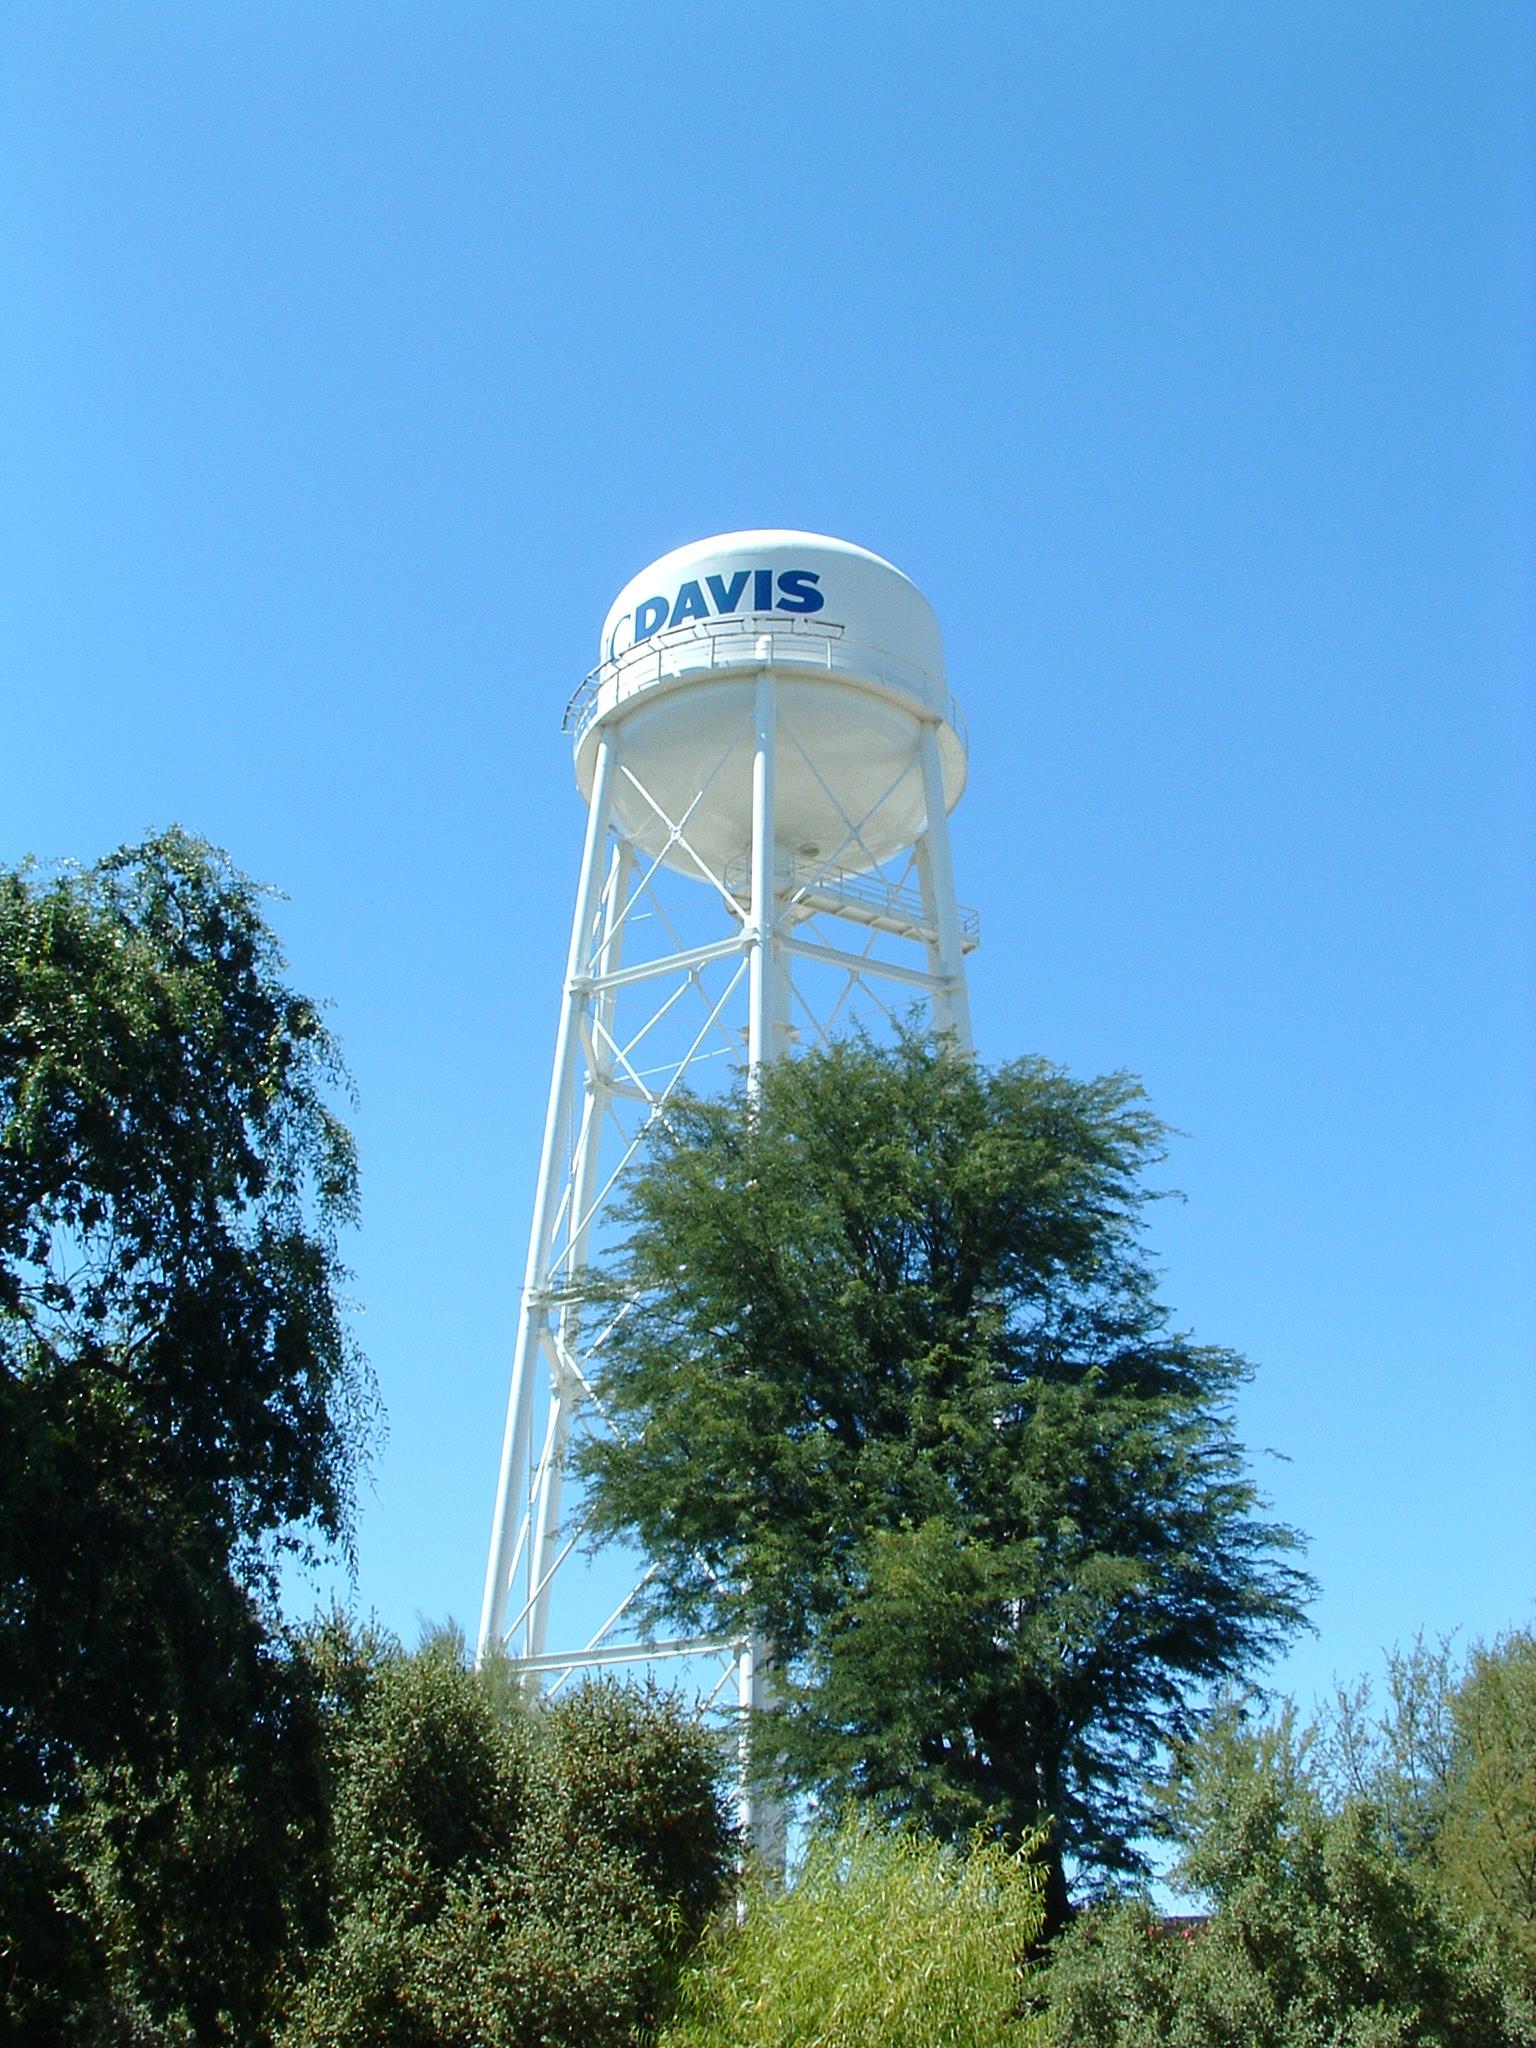 Davis Water Tower File:water Tower uc Davis.jpg